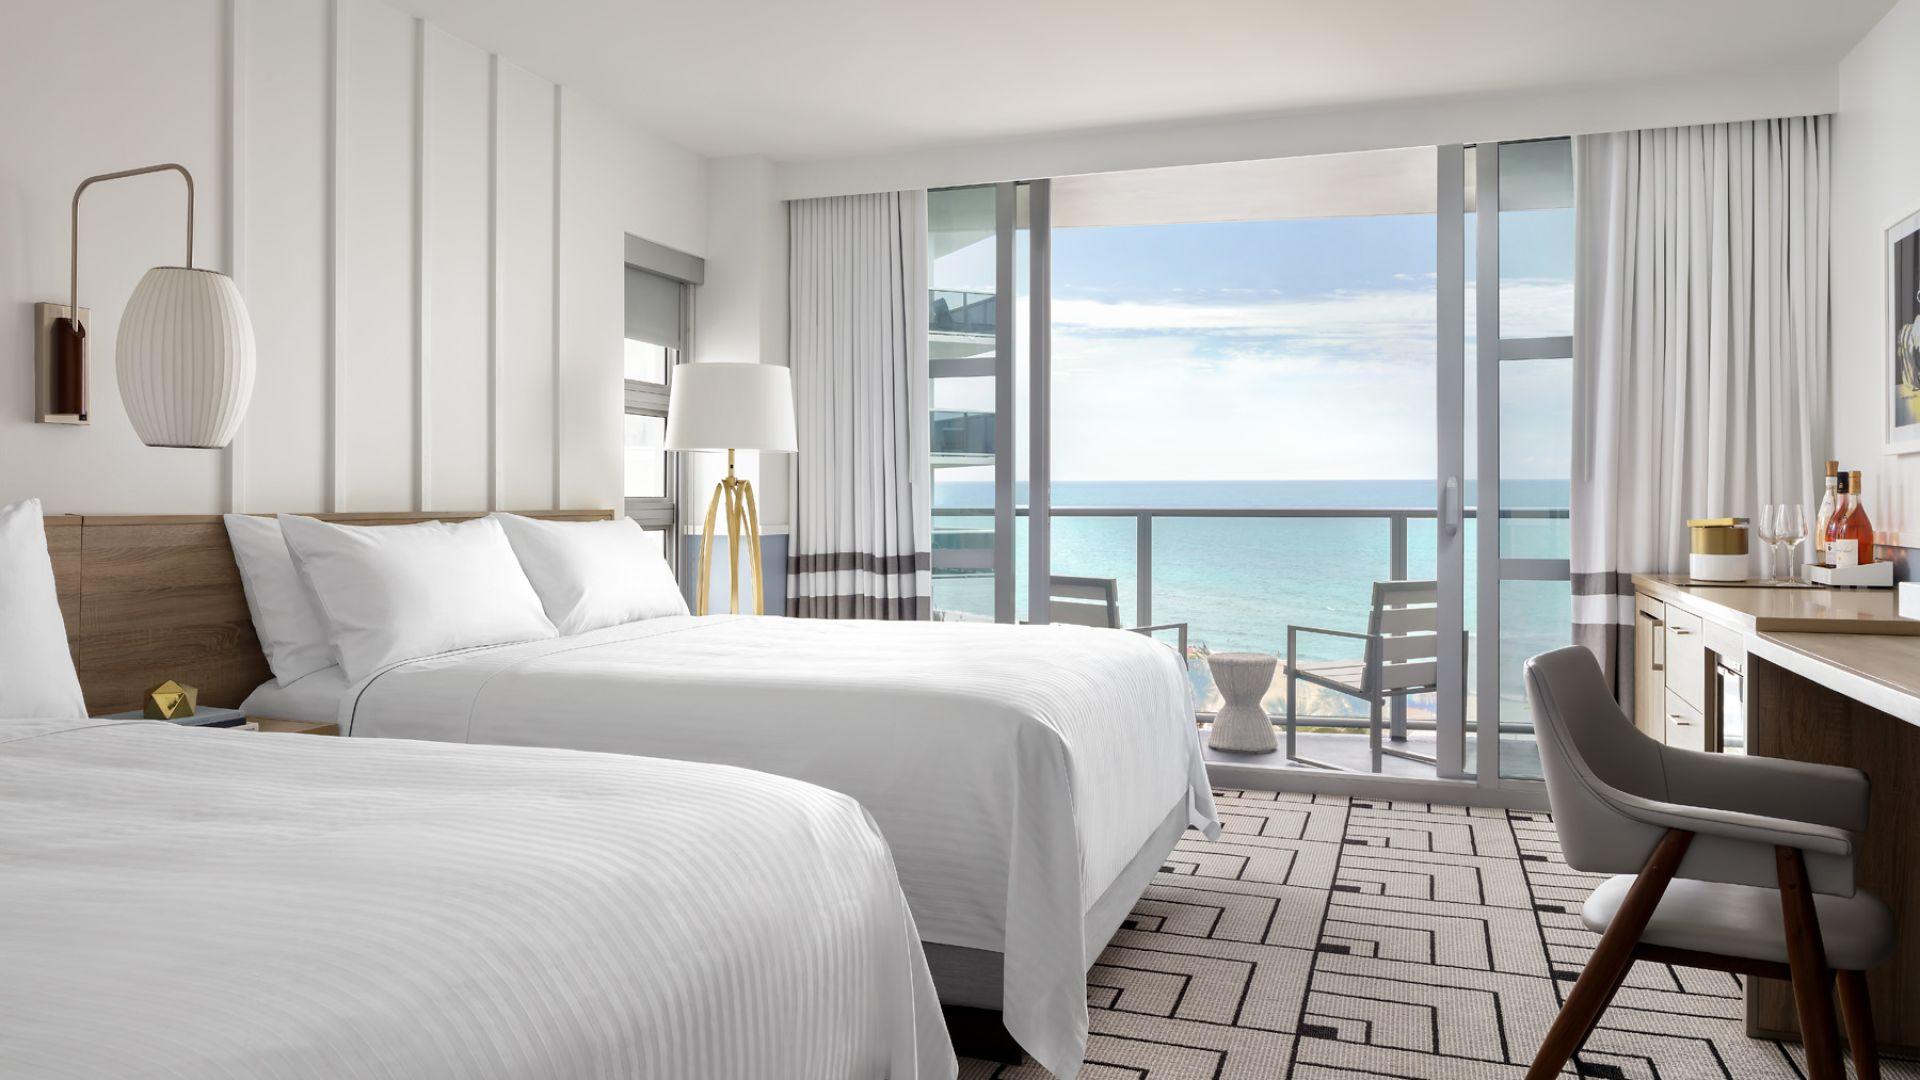 Oceanfront Hotel In Miami Beach 2 Bedroom Suites Cadillac Hotel